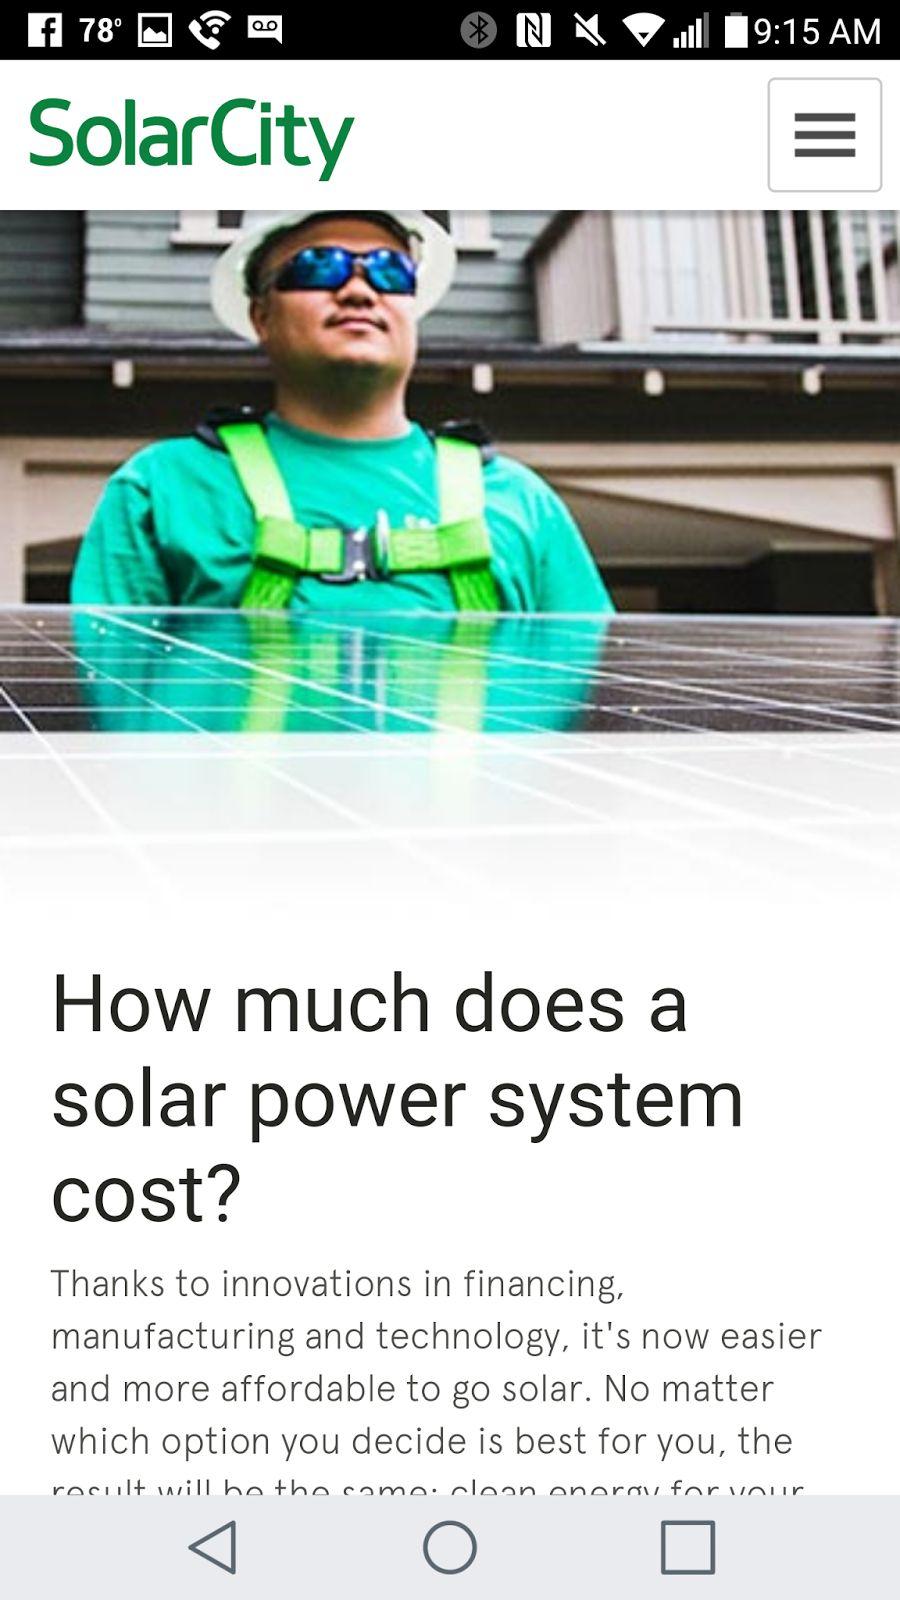 solar city mobile web design